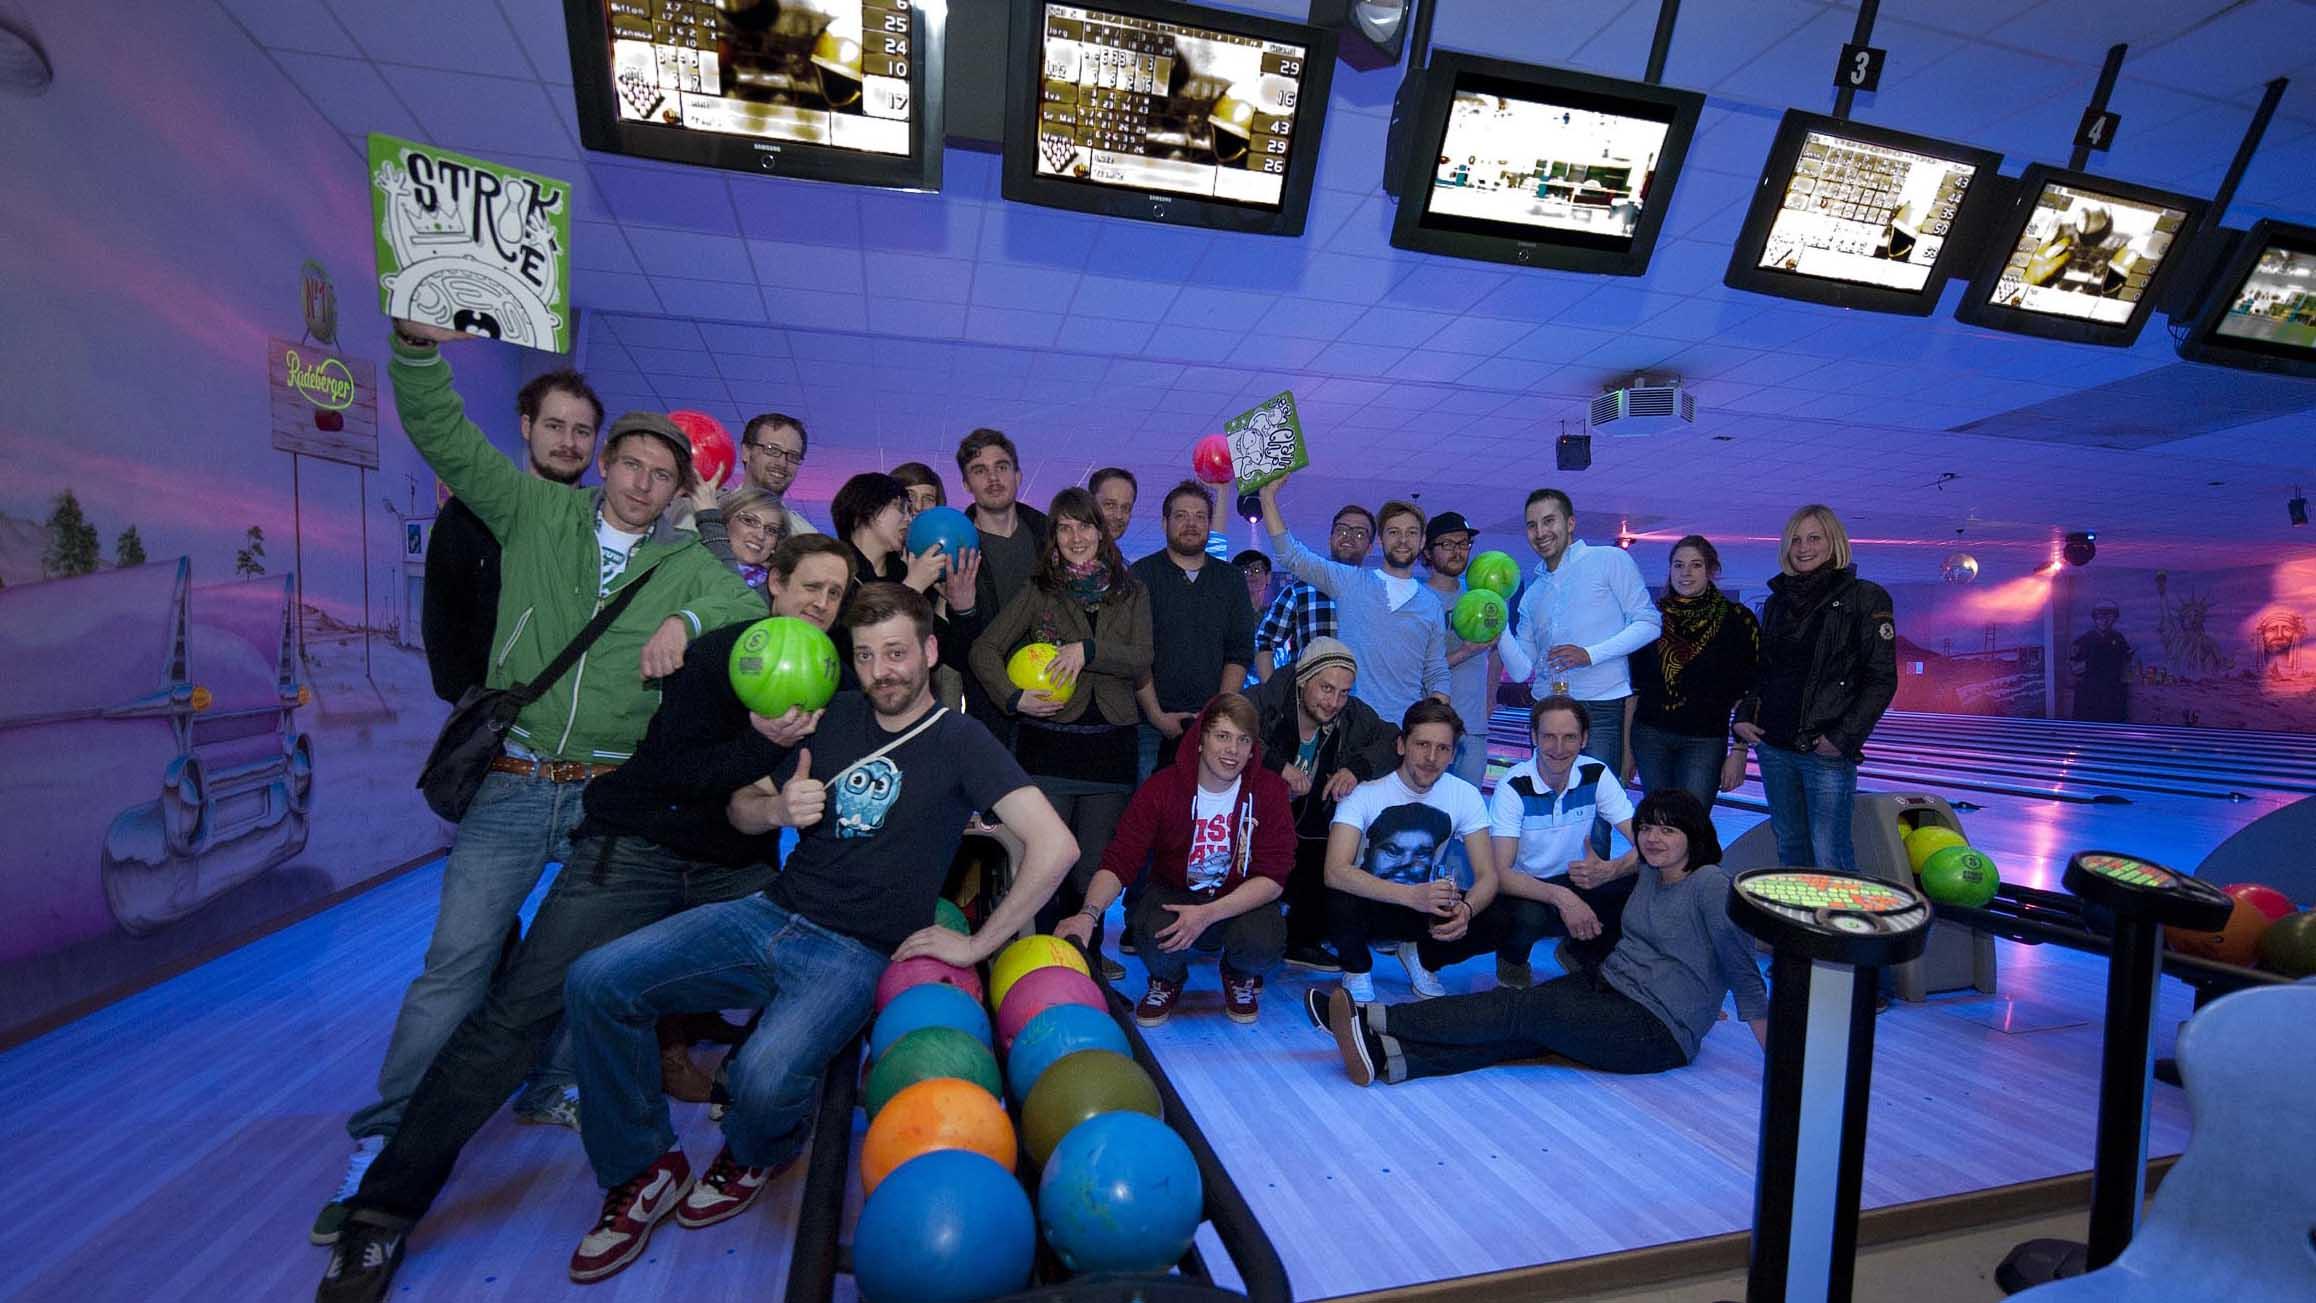 celle-pinguin-bowlingbar-gruppe